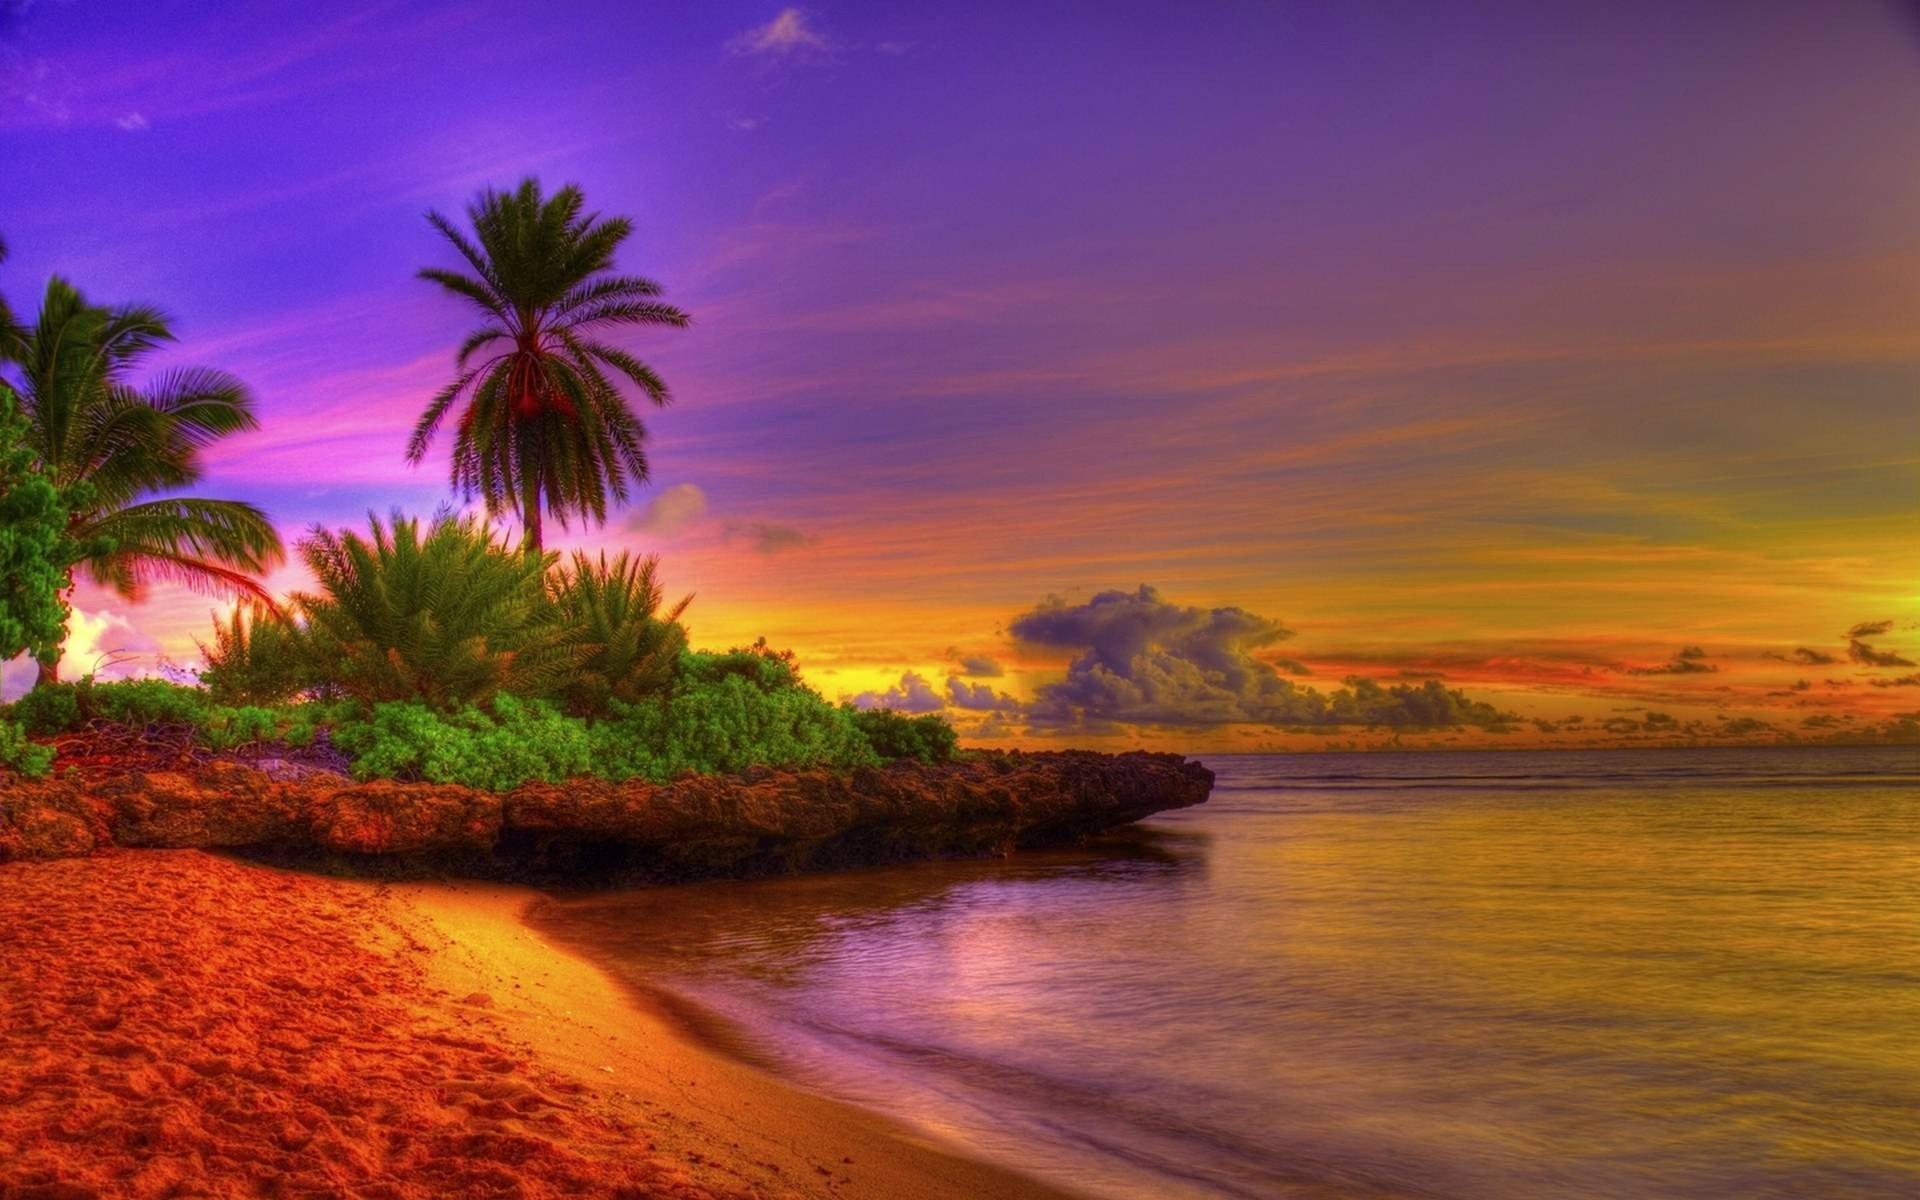 39+ Tropical Beach HD Wallpaper on WallpaperSafari